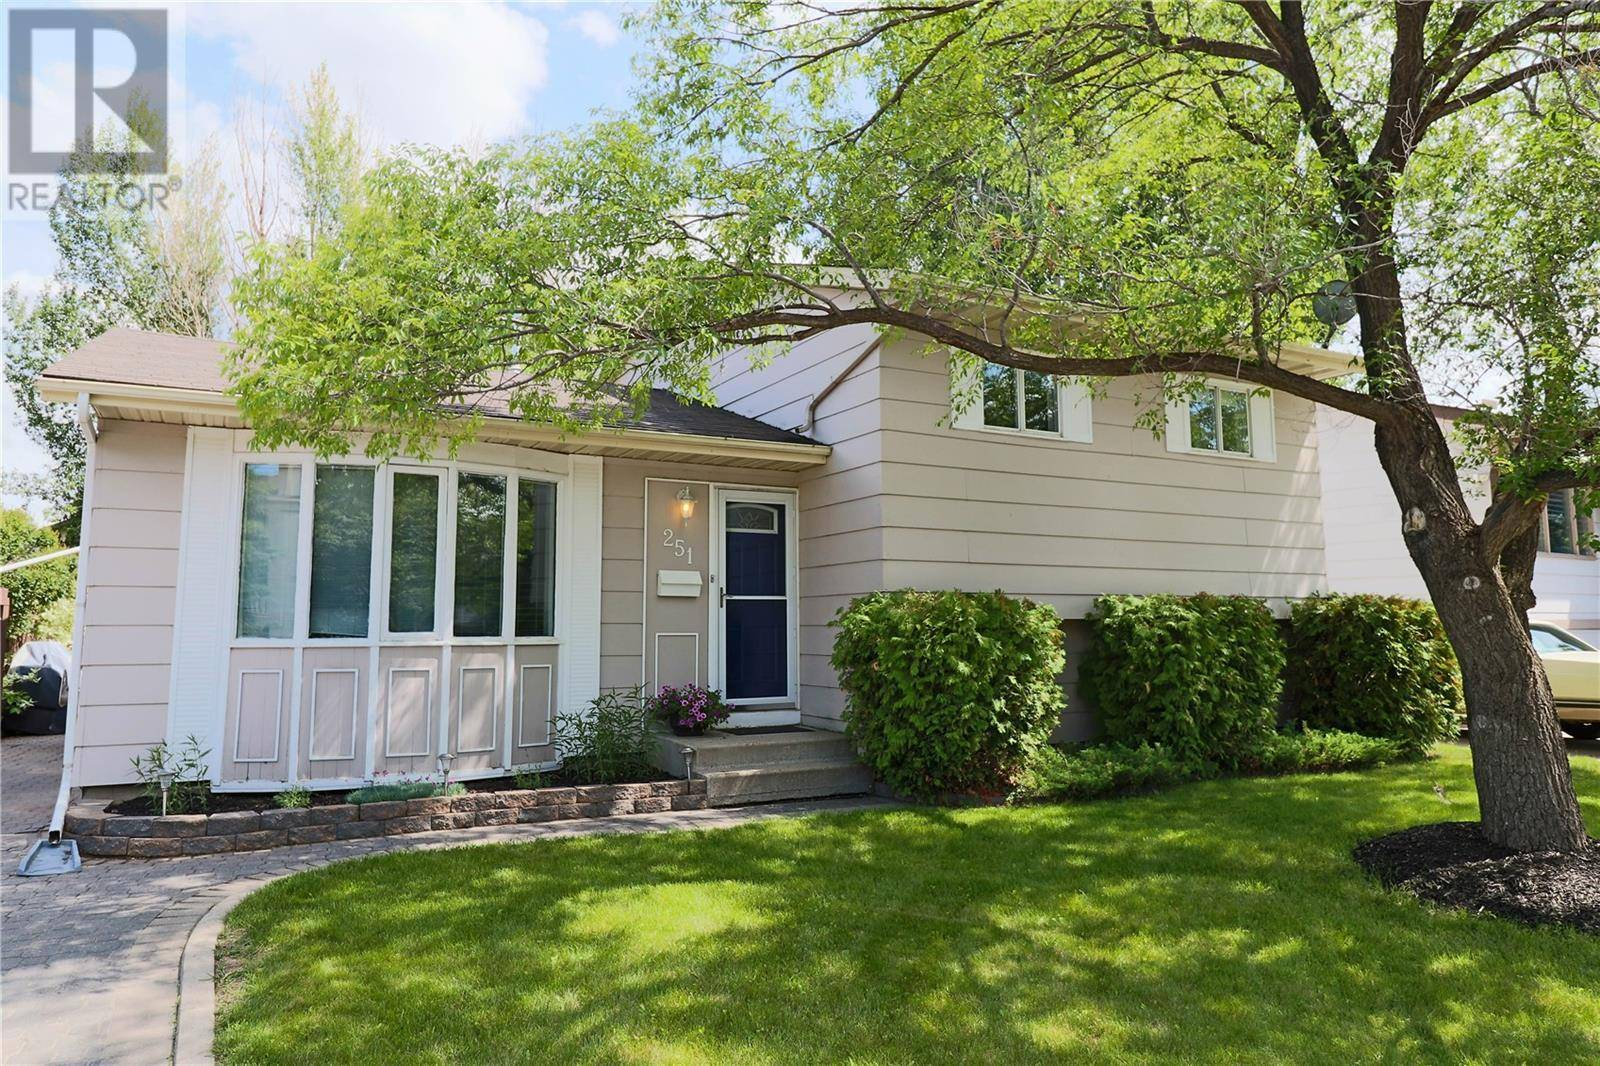 House for sale at 251 Weyakwin Dr Saskatoon Saskatchewan - MLS: SK779182